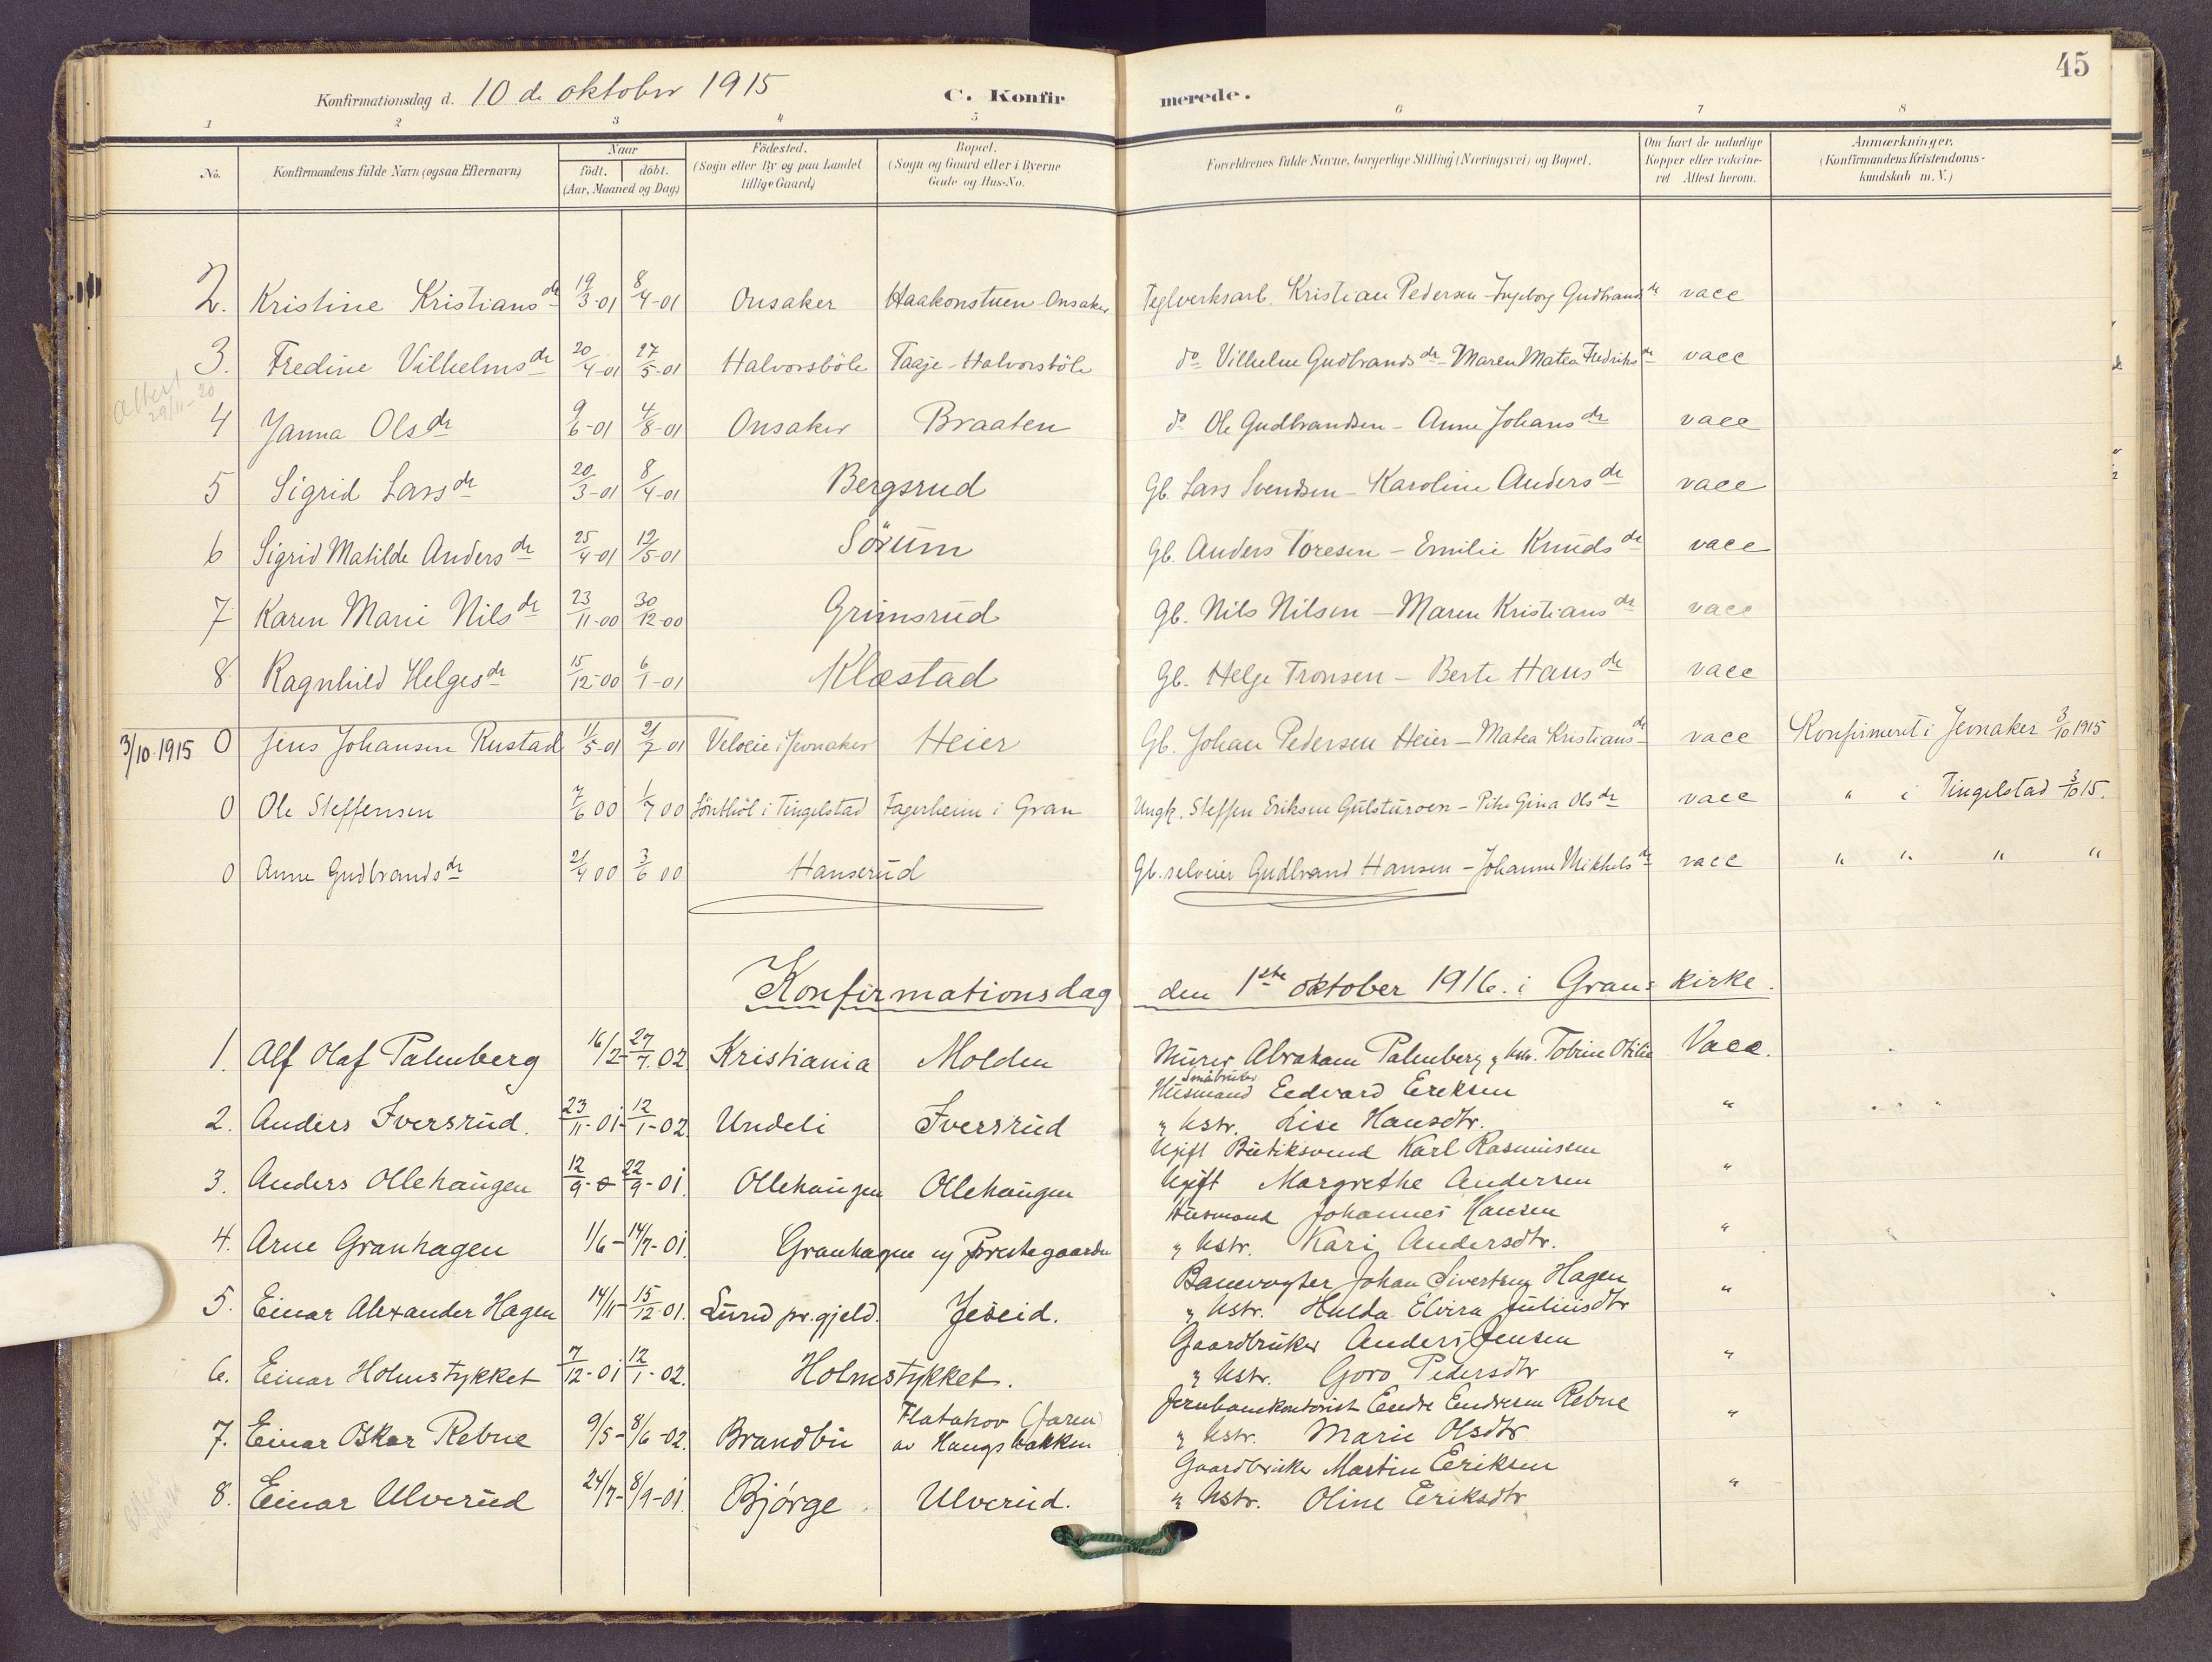 SAH, Gran prestekontor, Ministerialbok nr. 22, 1908-1918, s. 45